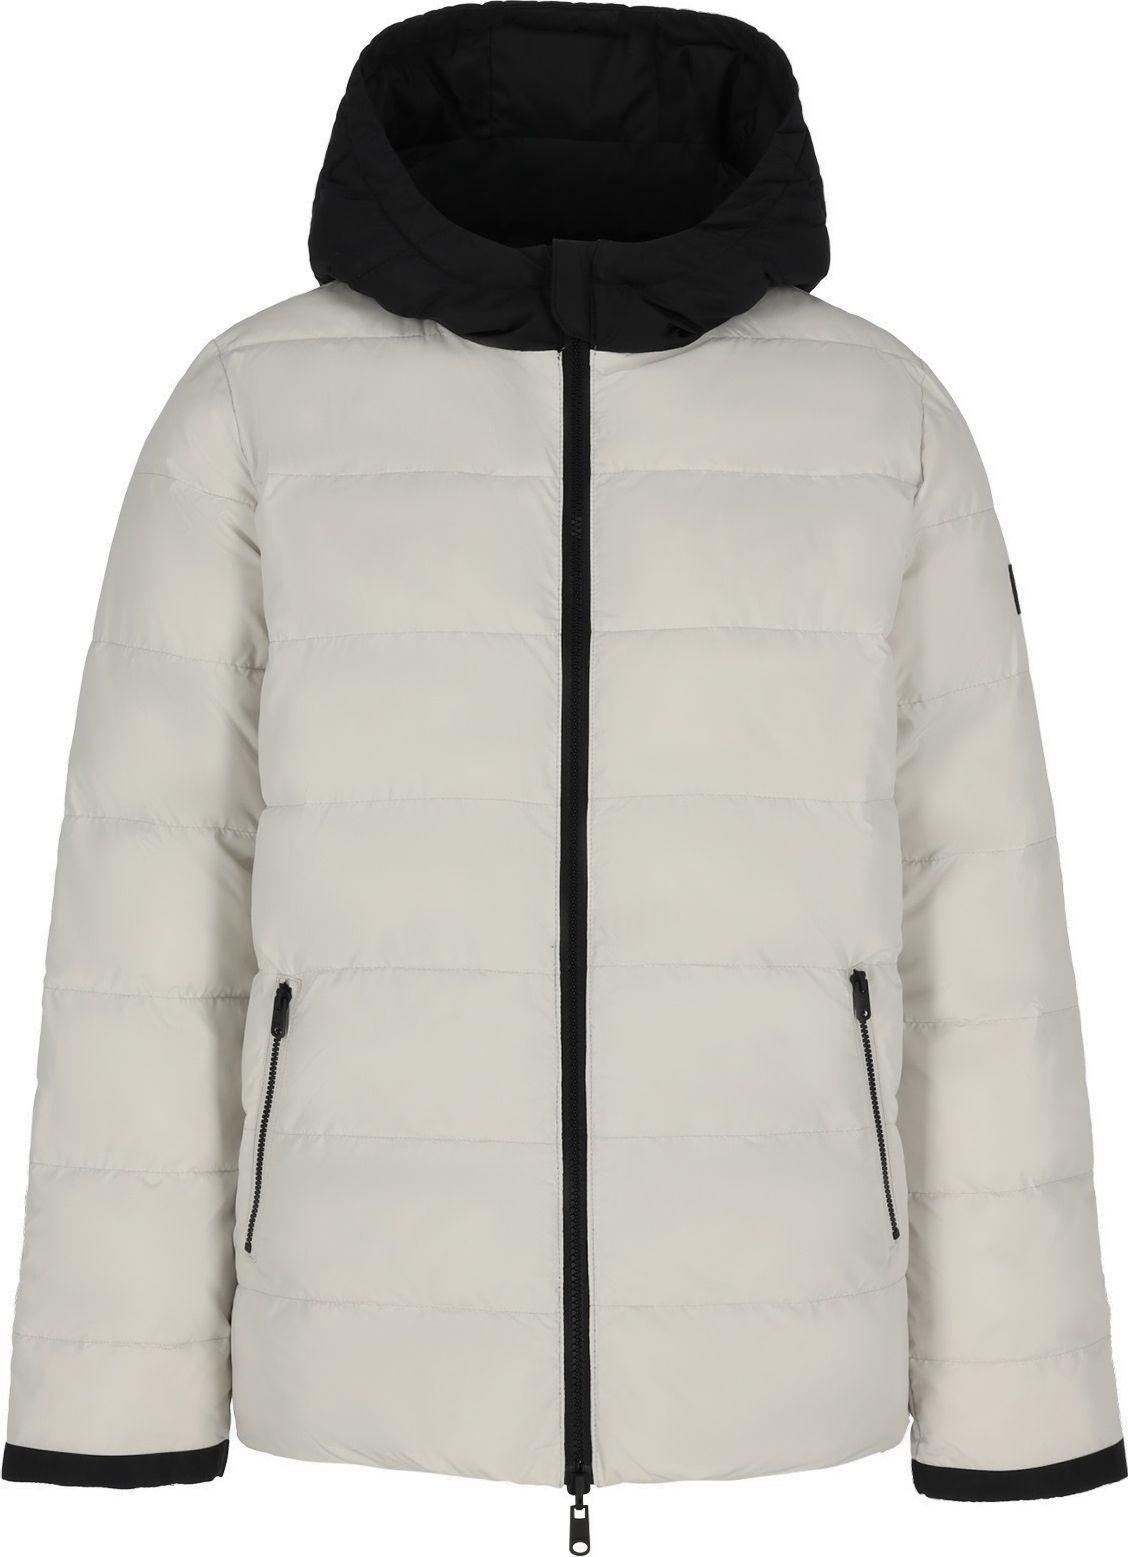 ECOALF New Crosetalf Jacket Women's Ash XL